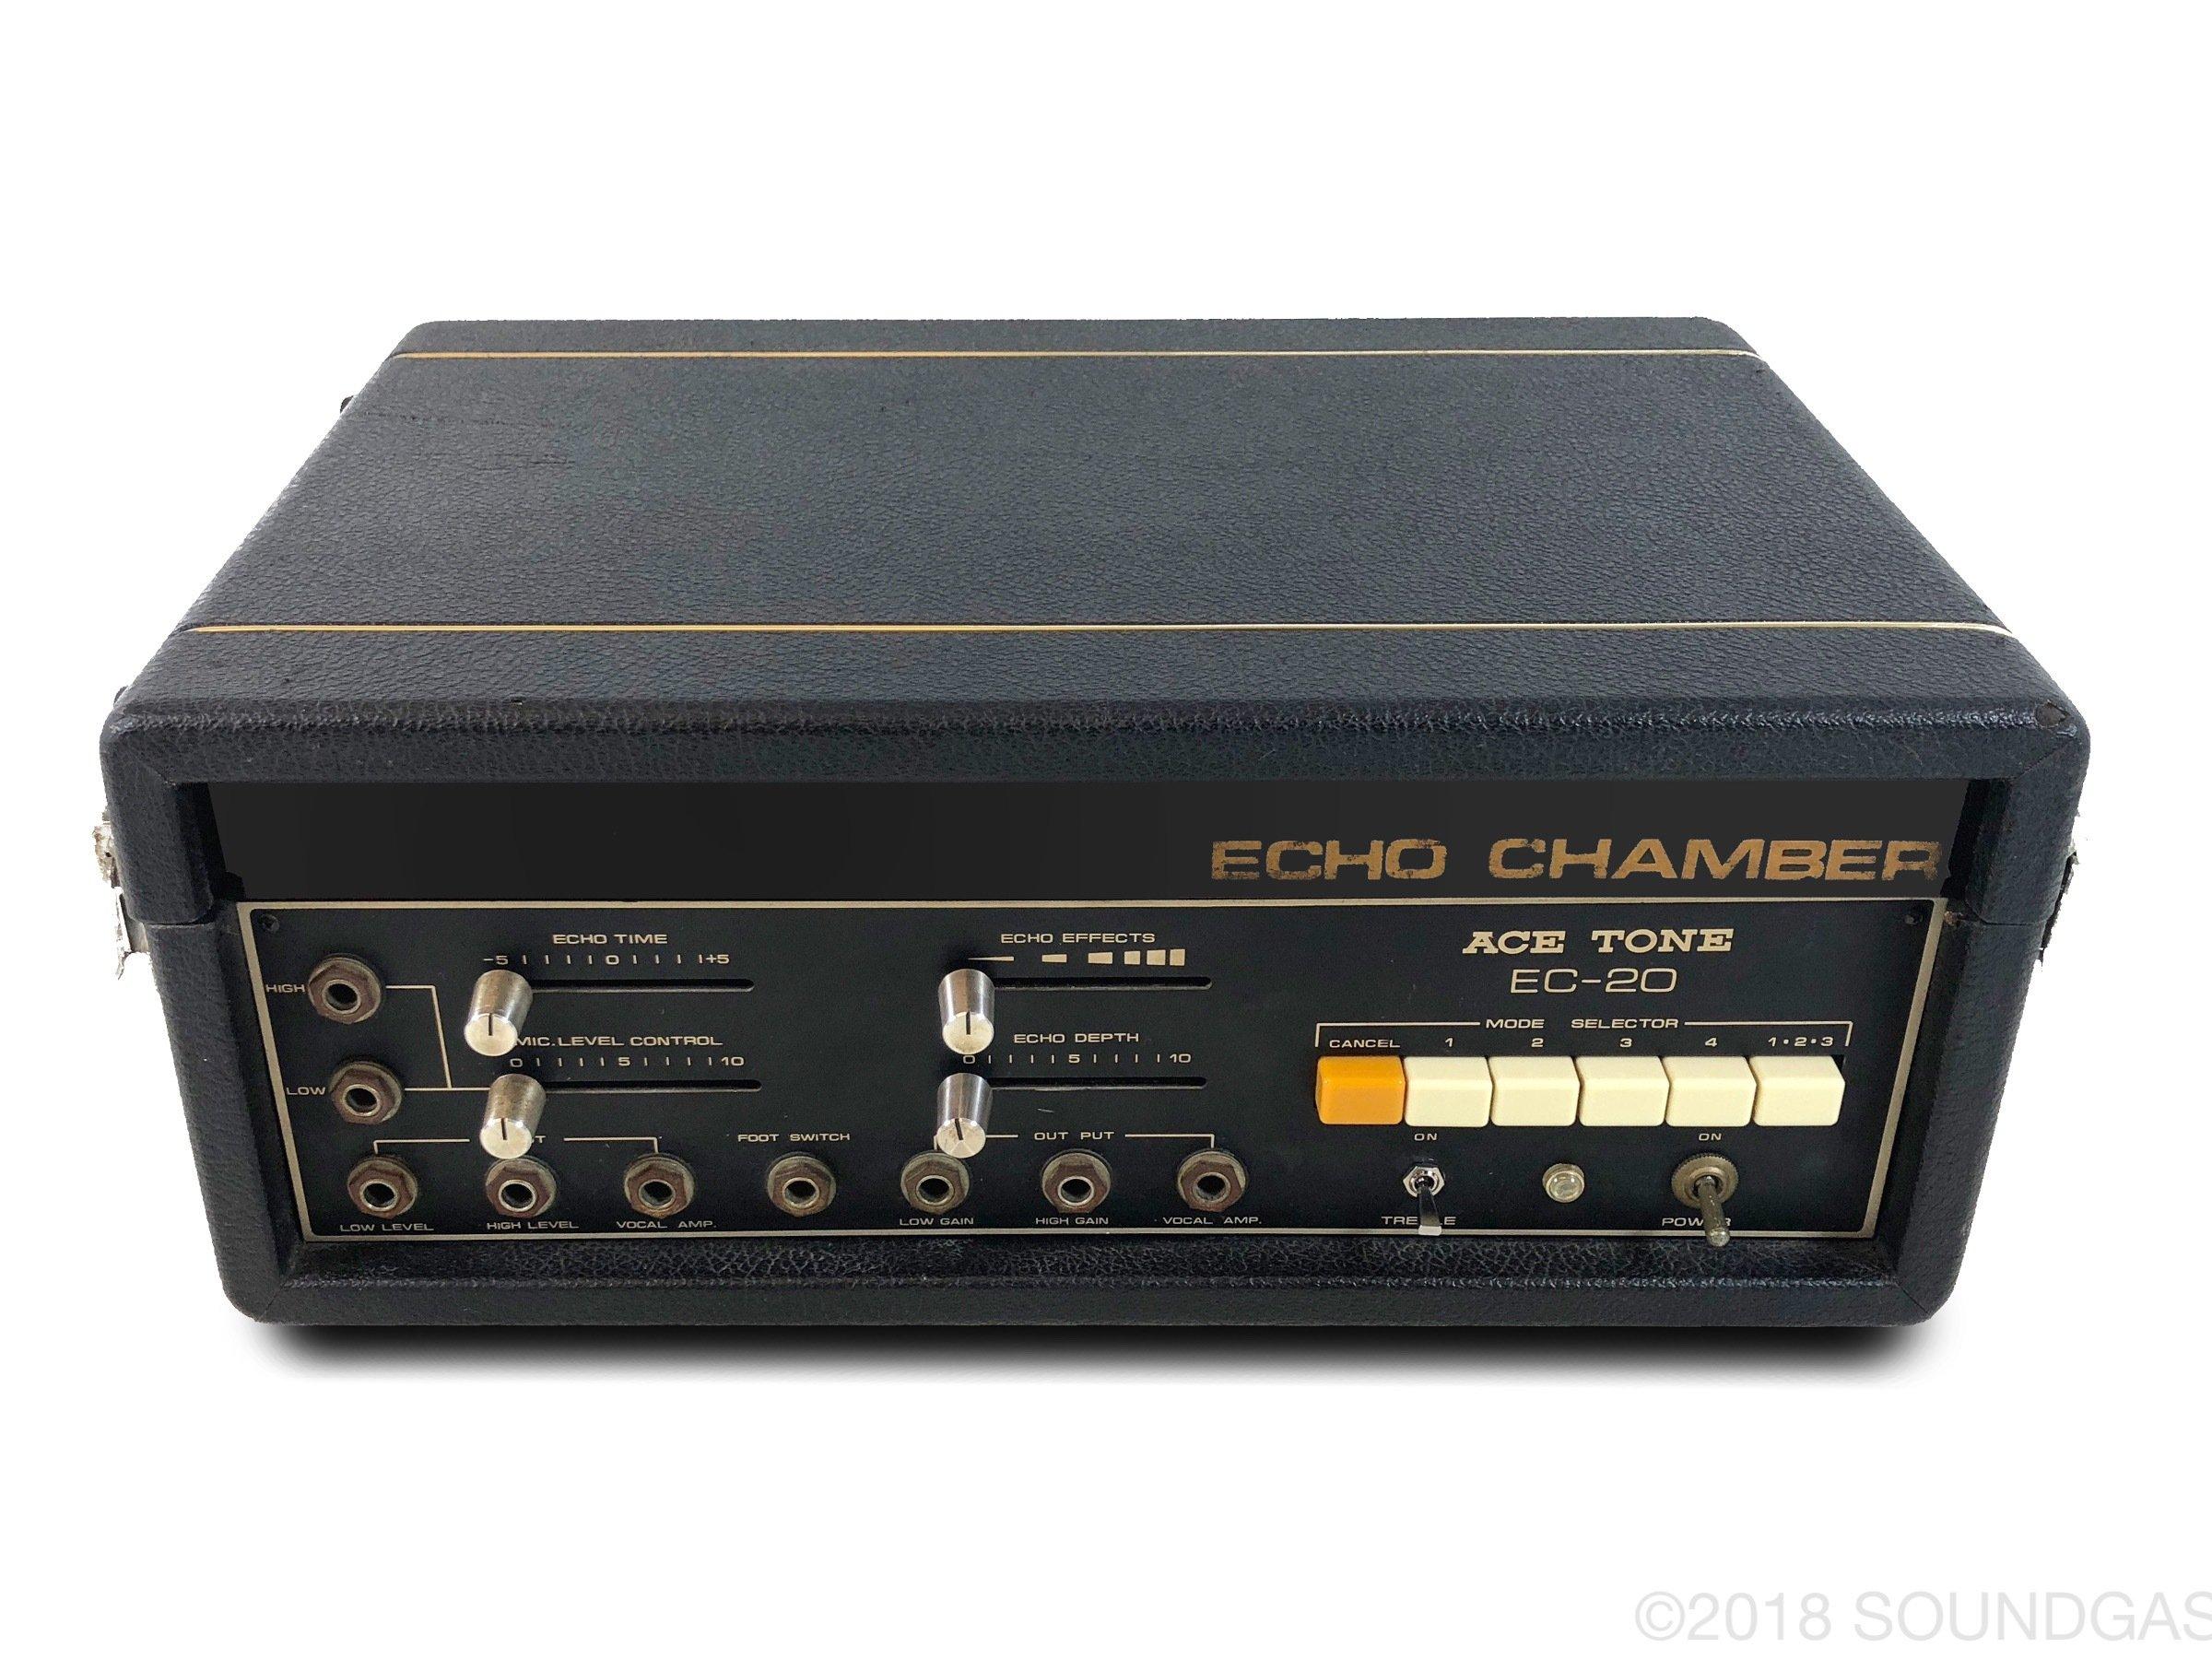 Ace-Tone-EC-20-Echo-Chamber-Cover-2_2bdb8d8e-ef61-4915-b6cd-458185ae9933